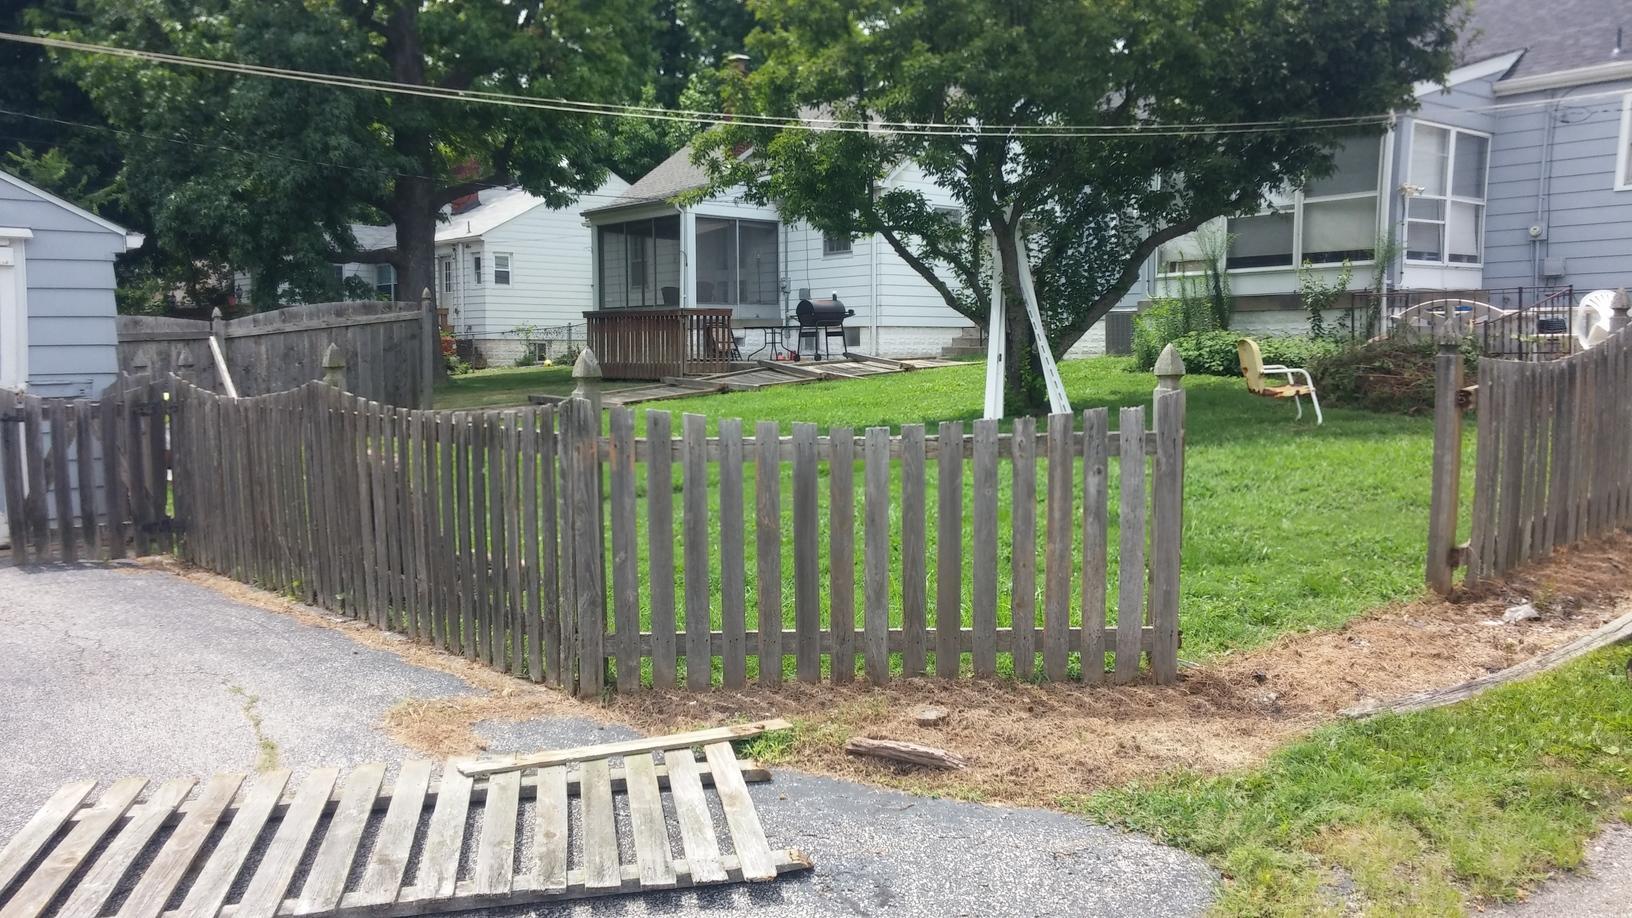 Vinyl Picket Fence Installation in Belleville, IL - Before Photo